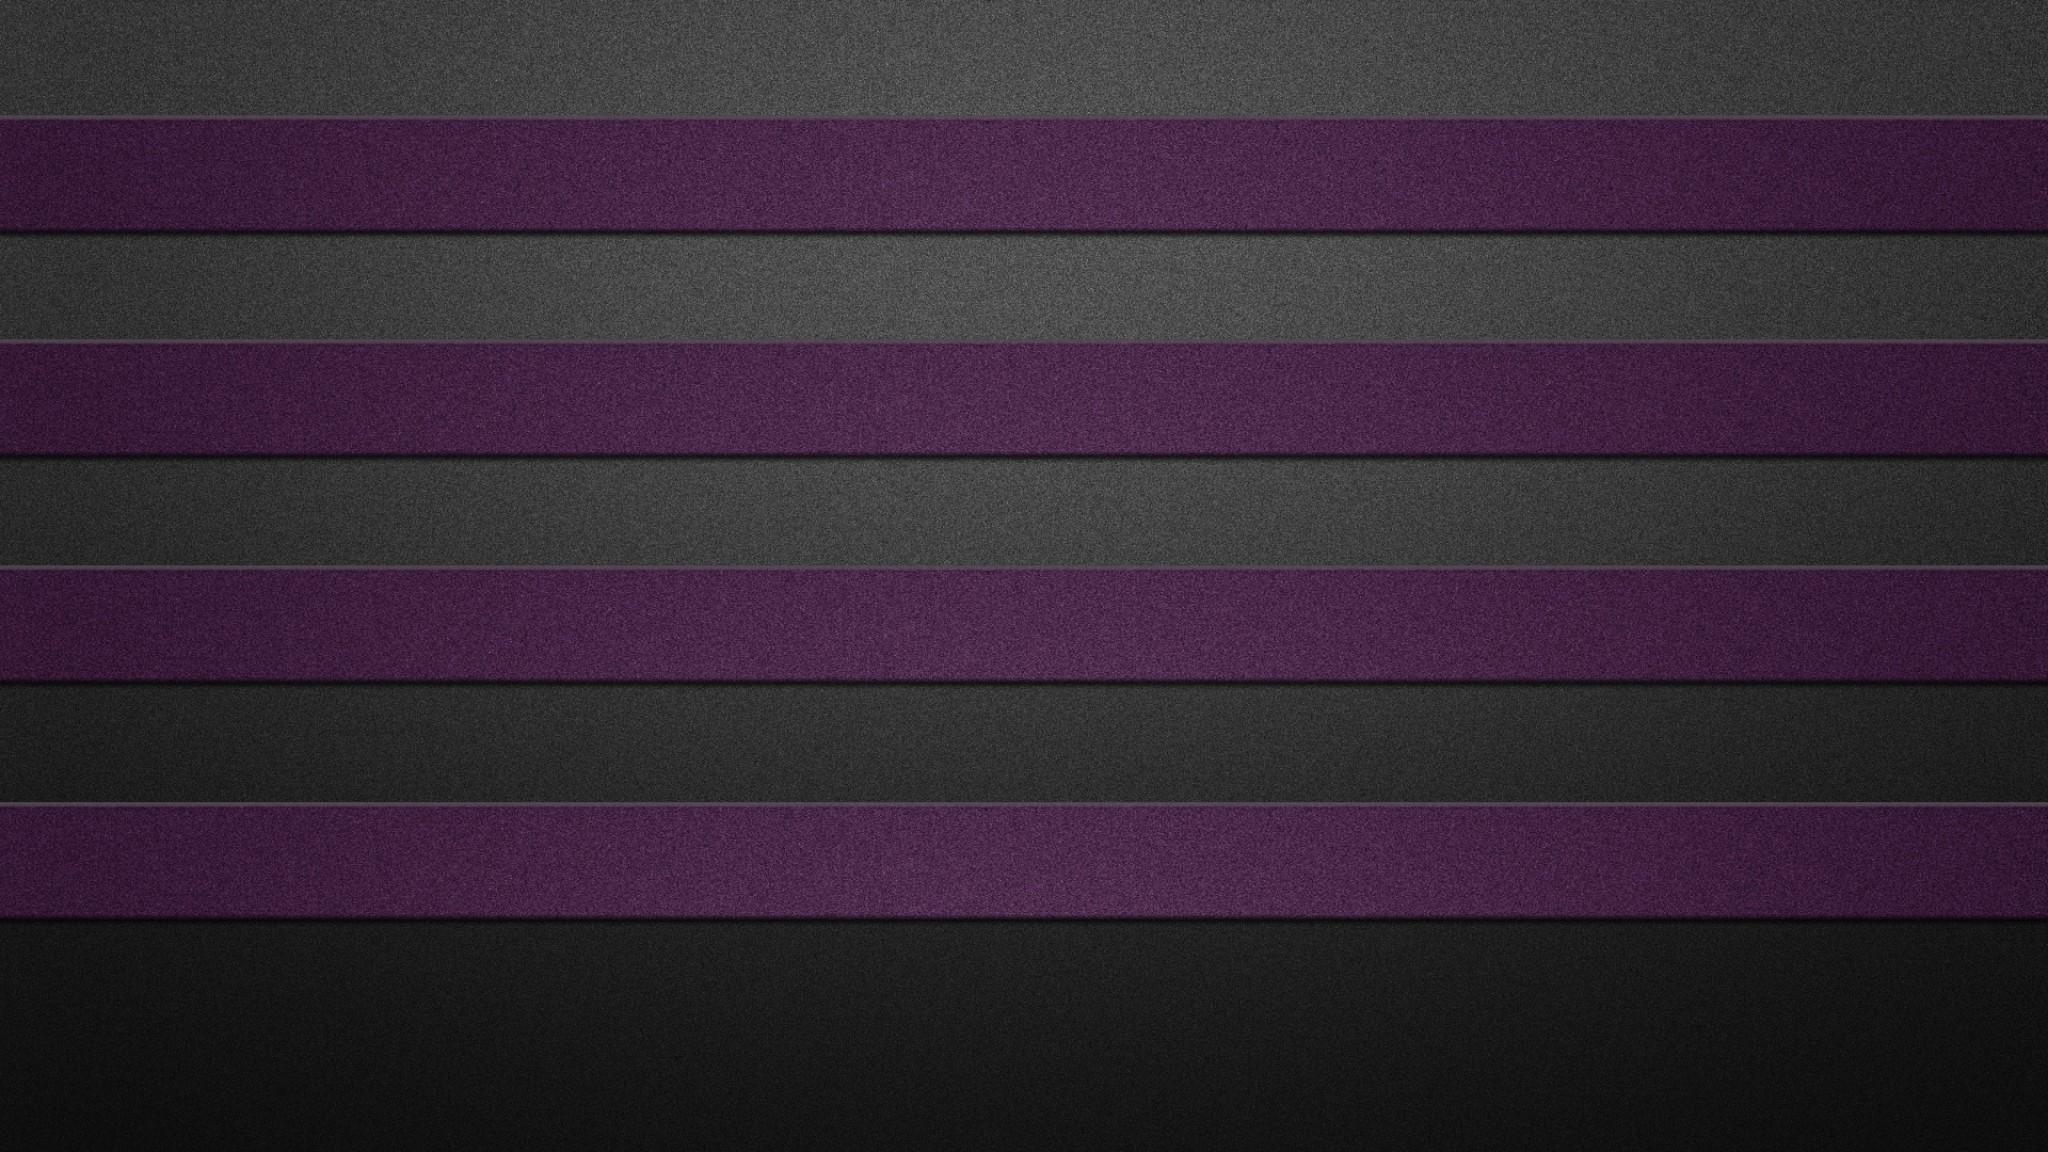 Wallpaper texture, stripes, four, purple, black and white